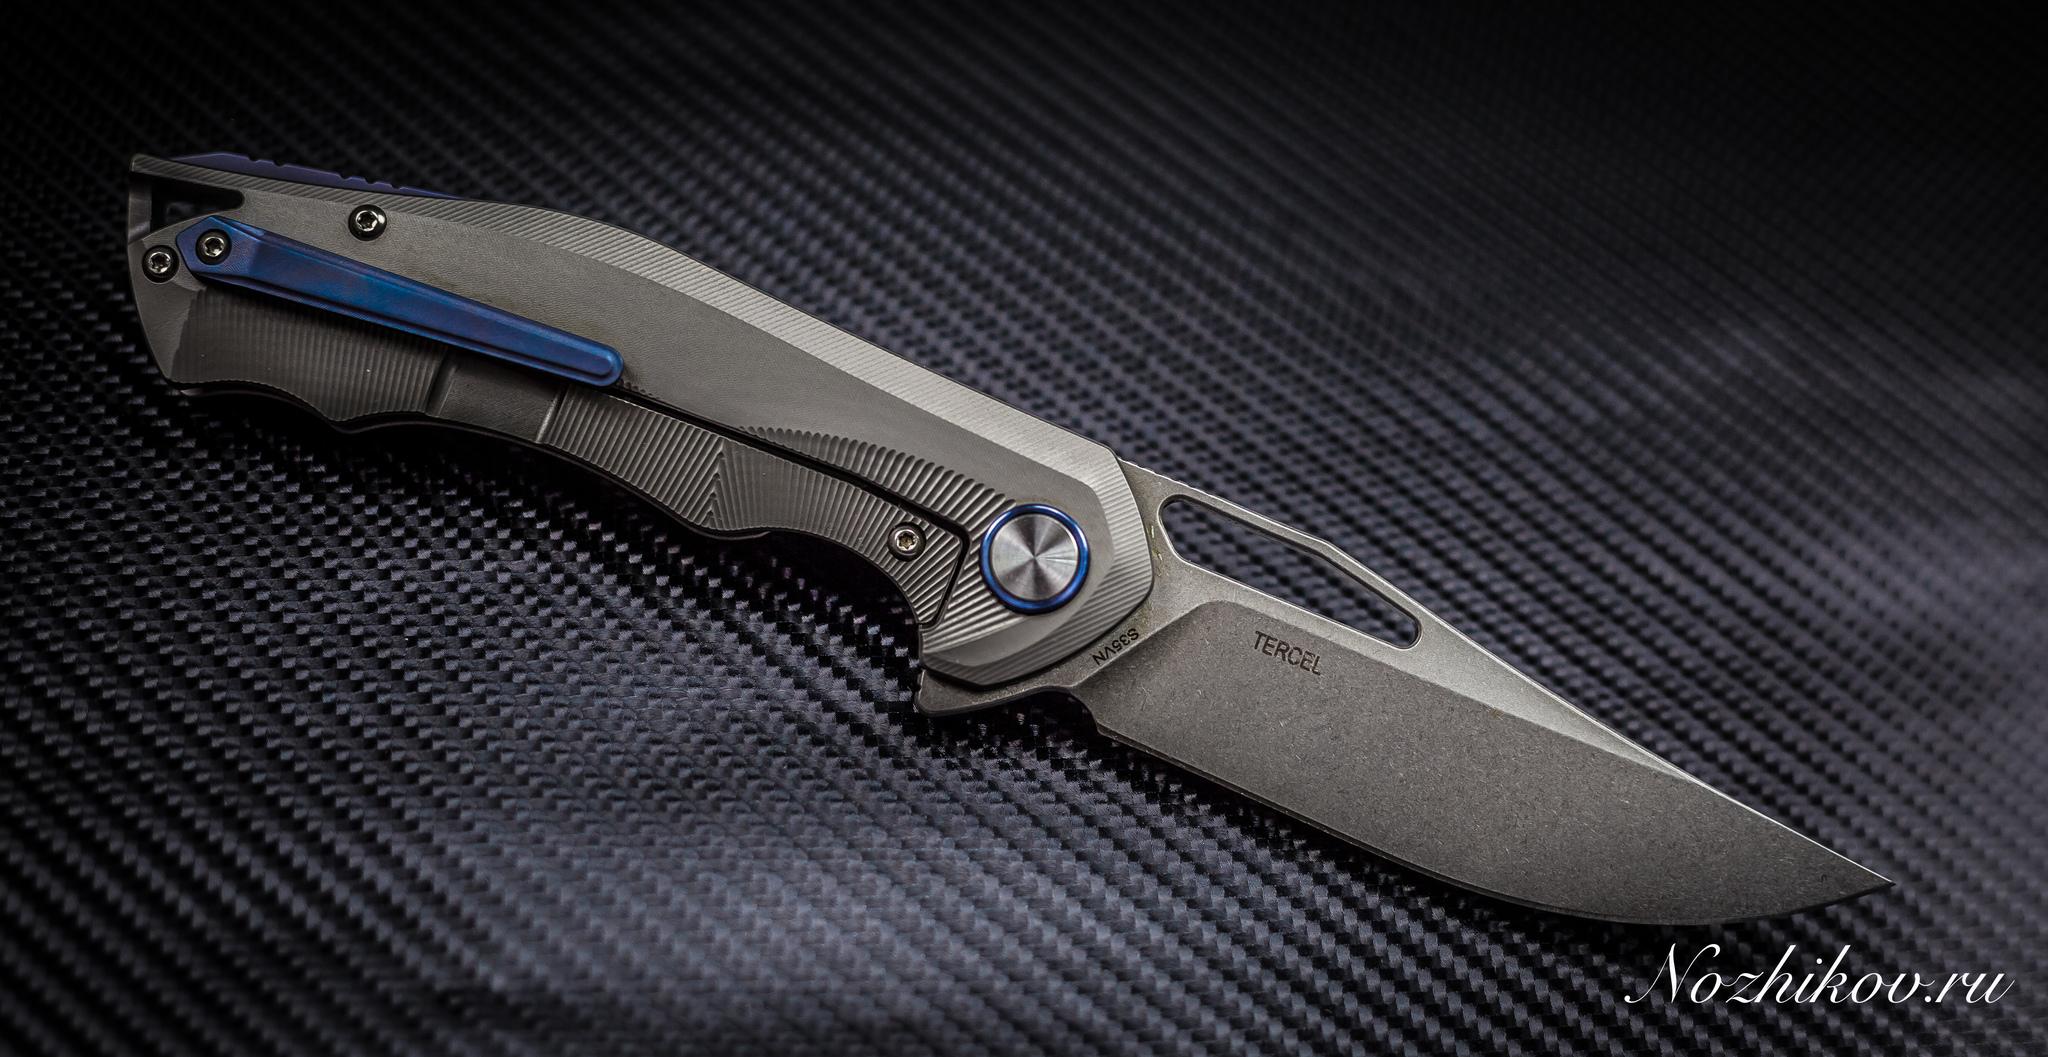 Фото 4 - Складной нож Bestech Tercel BT1708B, сталь CPM-S35VN, рукоять титан от Bestech Knives